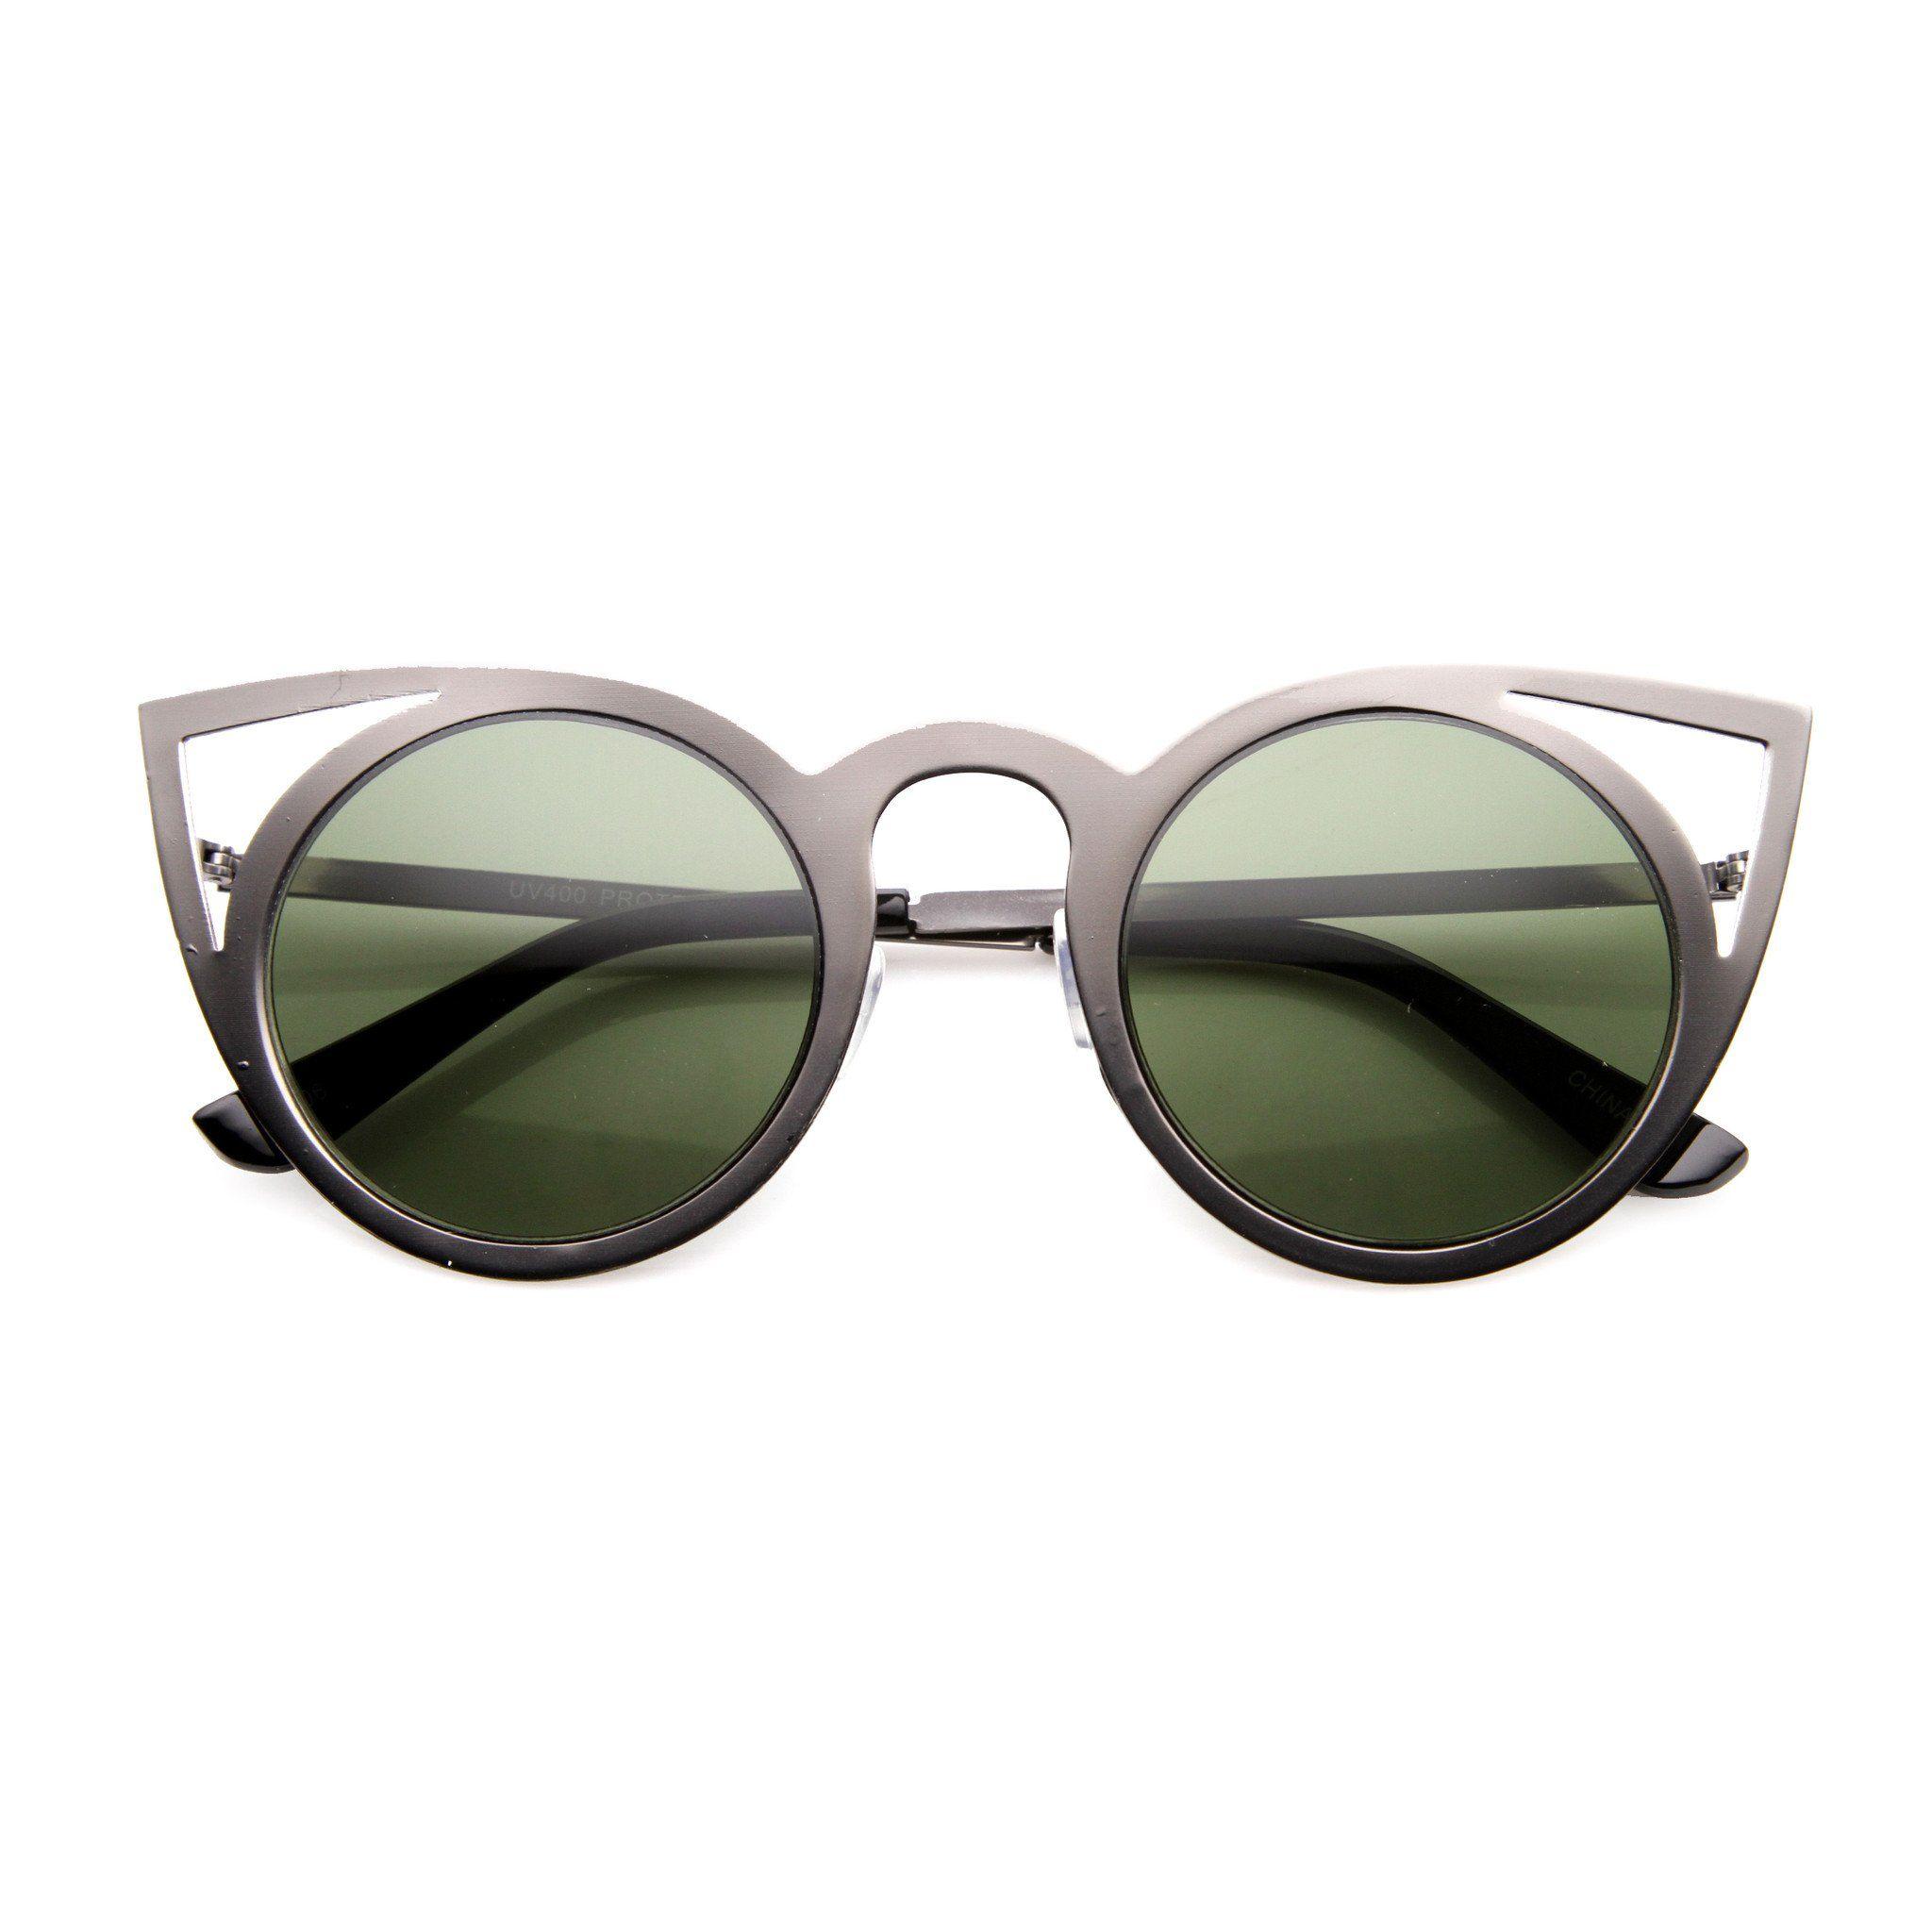 faed6f438f Women s Indie Round Laser Cut Metal Cat Eye Sunglasses